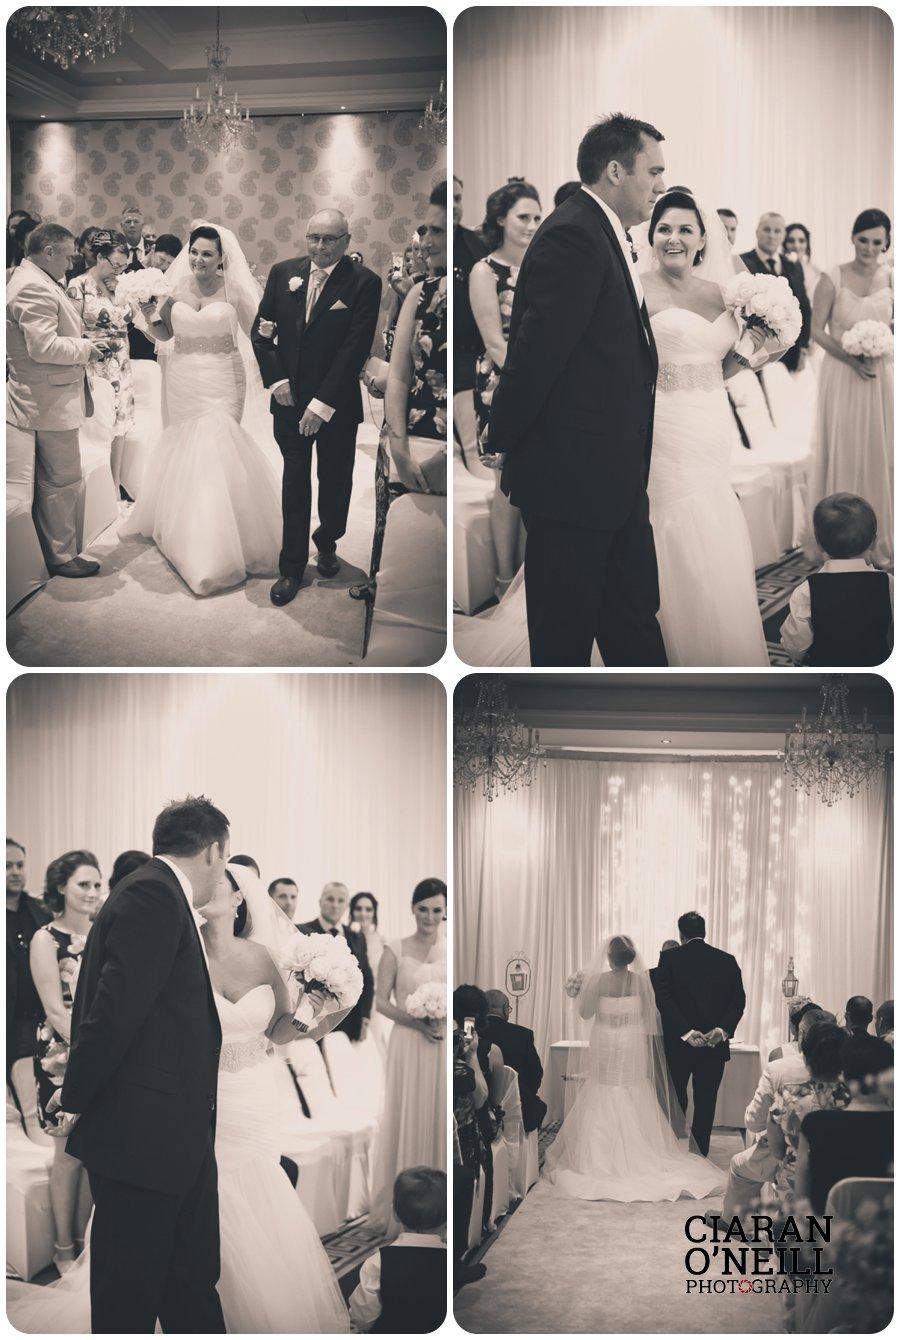 Lorna & David's wedding at the Manor House Hotel by Ciaran O'Neill Photography 06